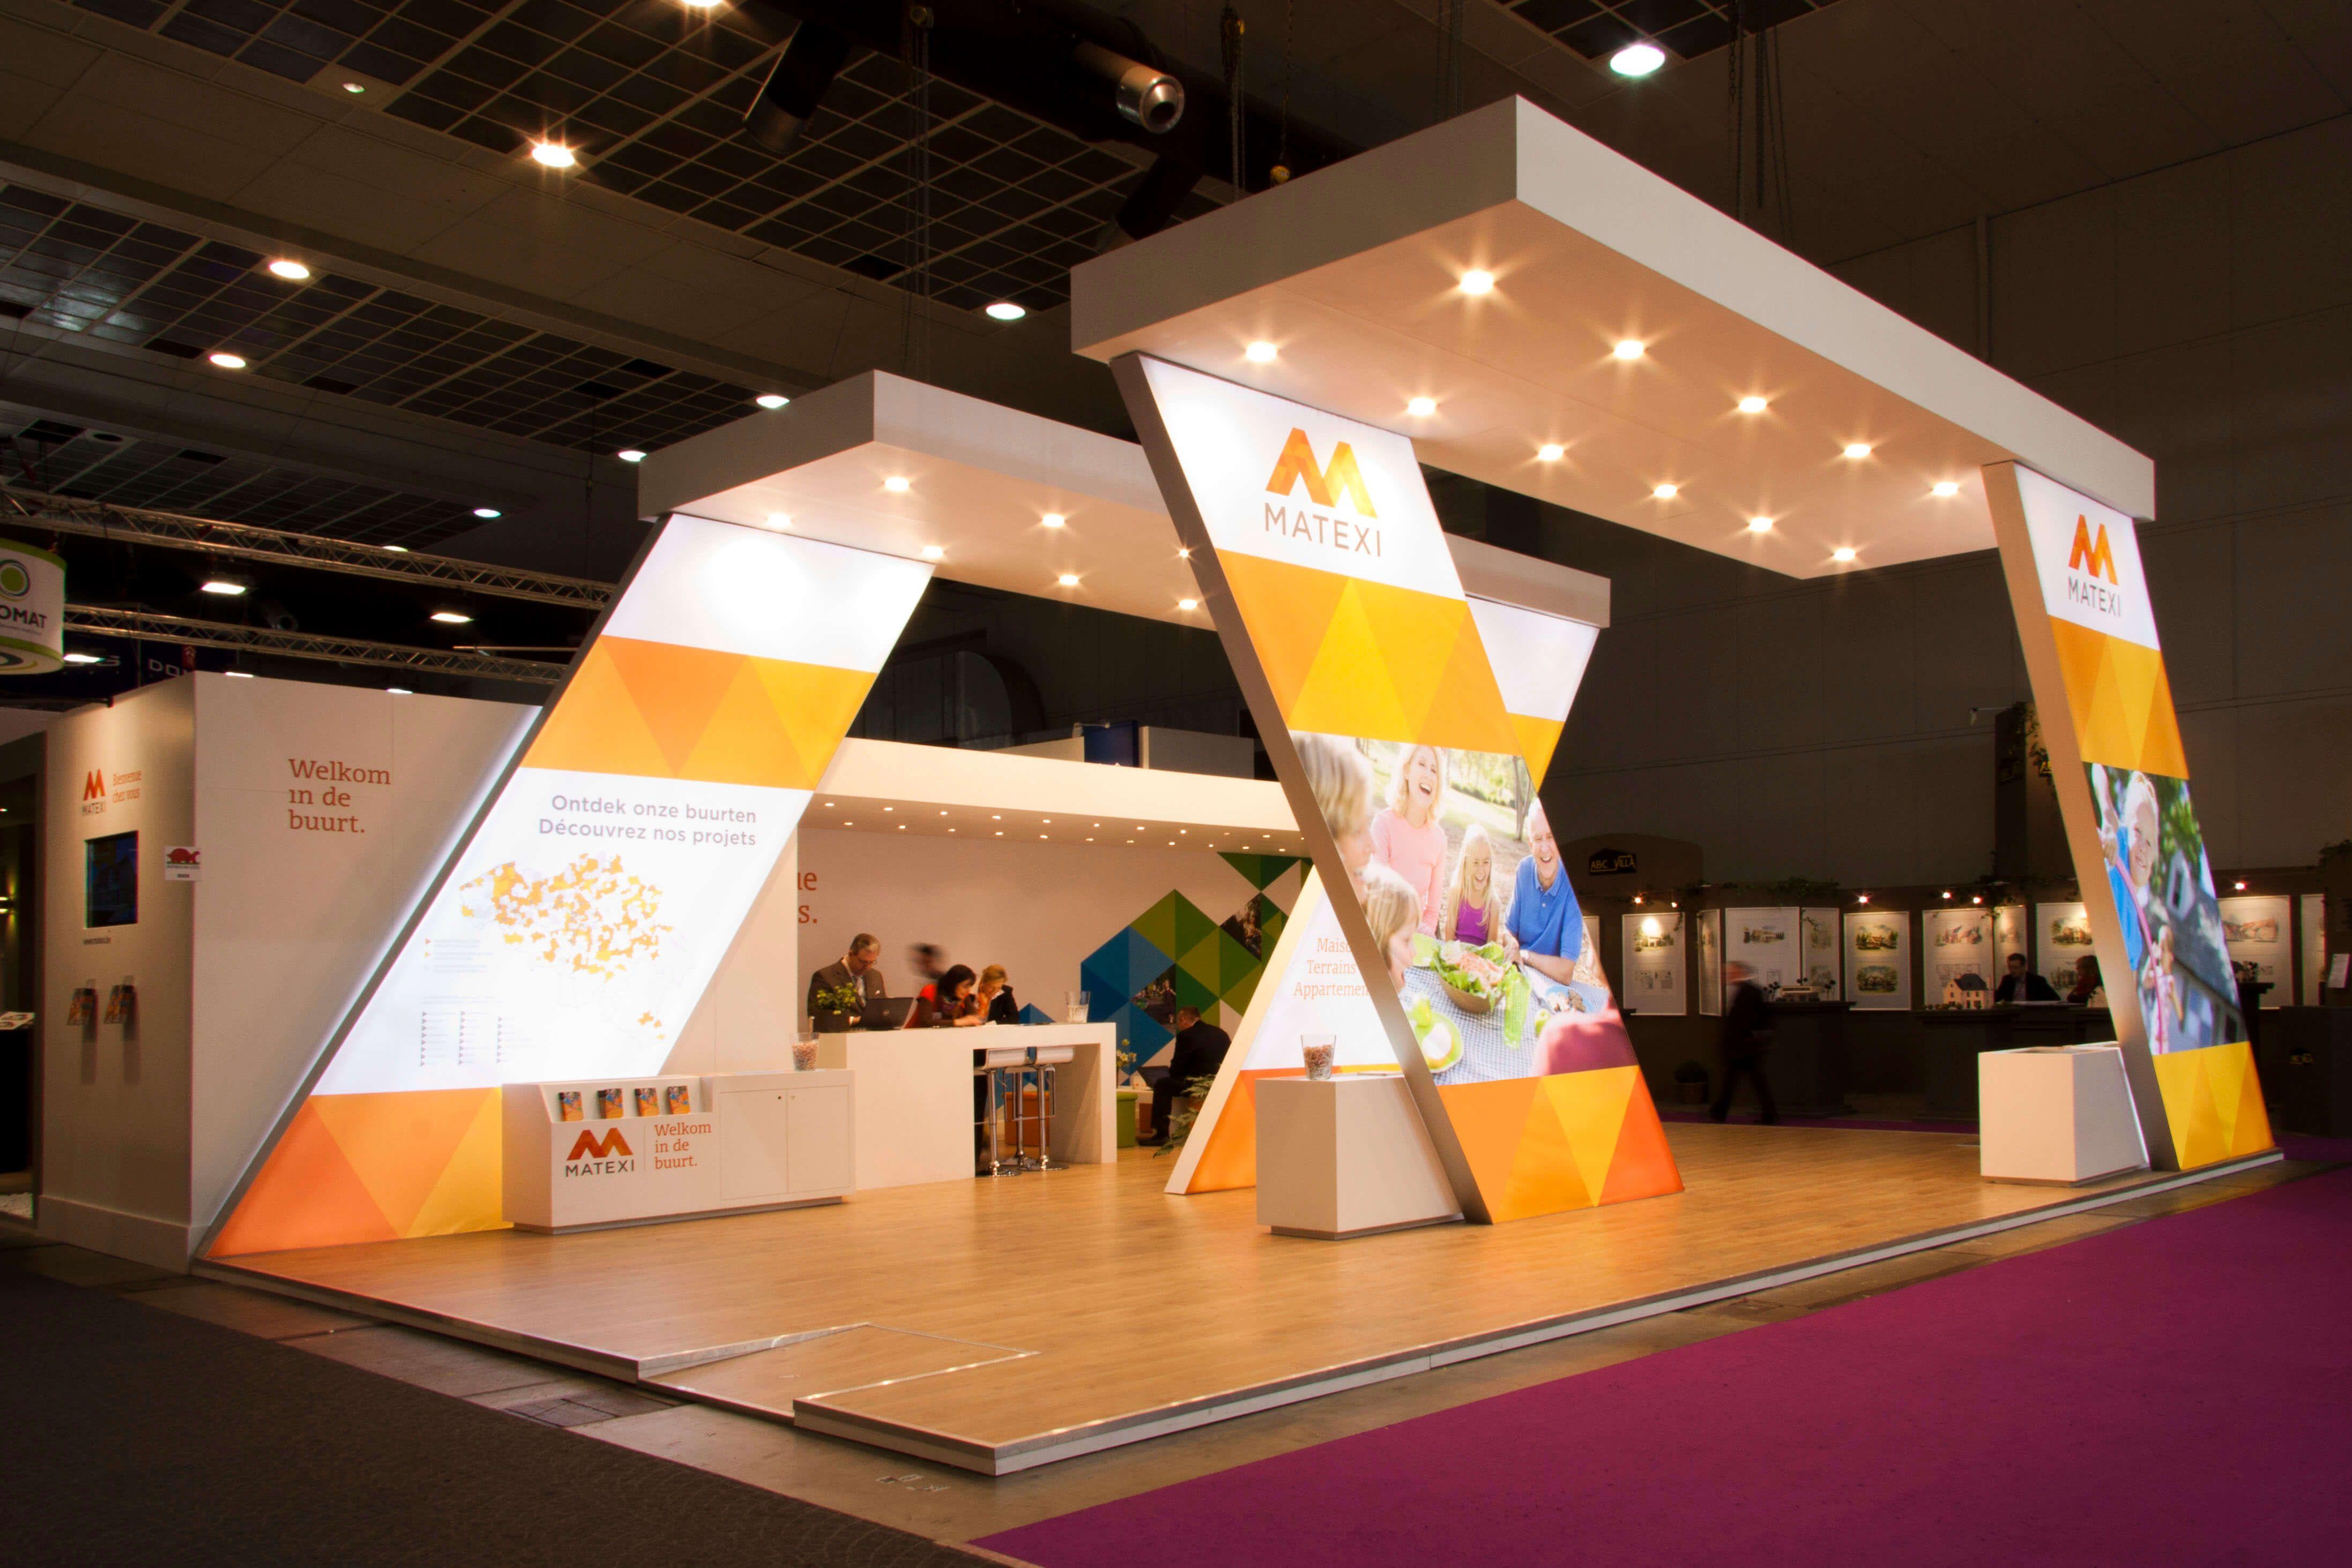 Exhibition Stand Design Abu Dhabi : Exhibition stand design company dubai abu dhabi 展示